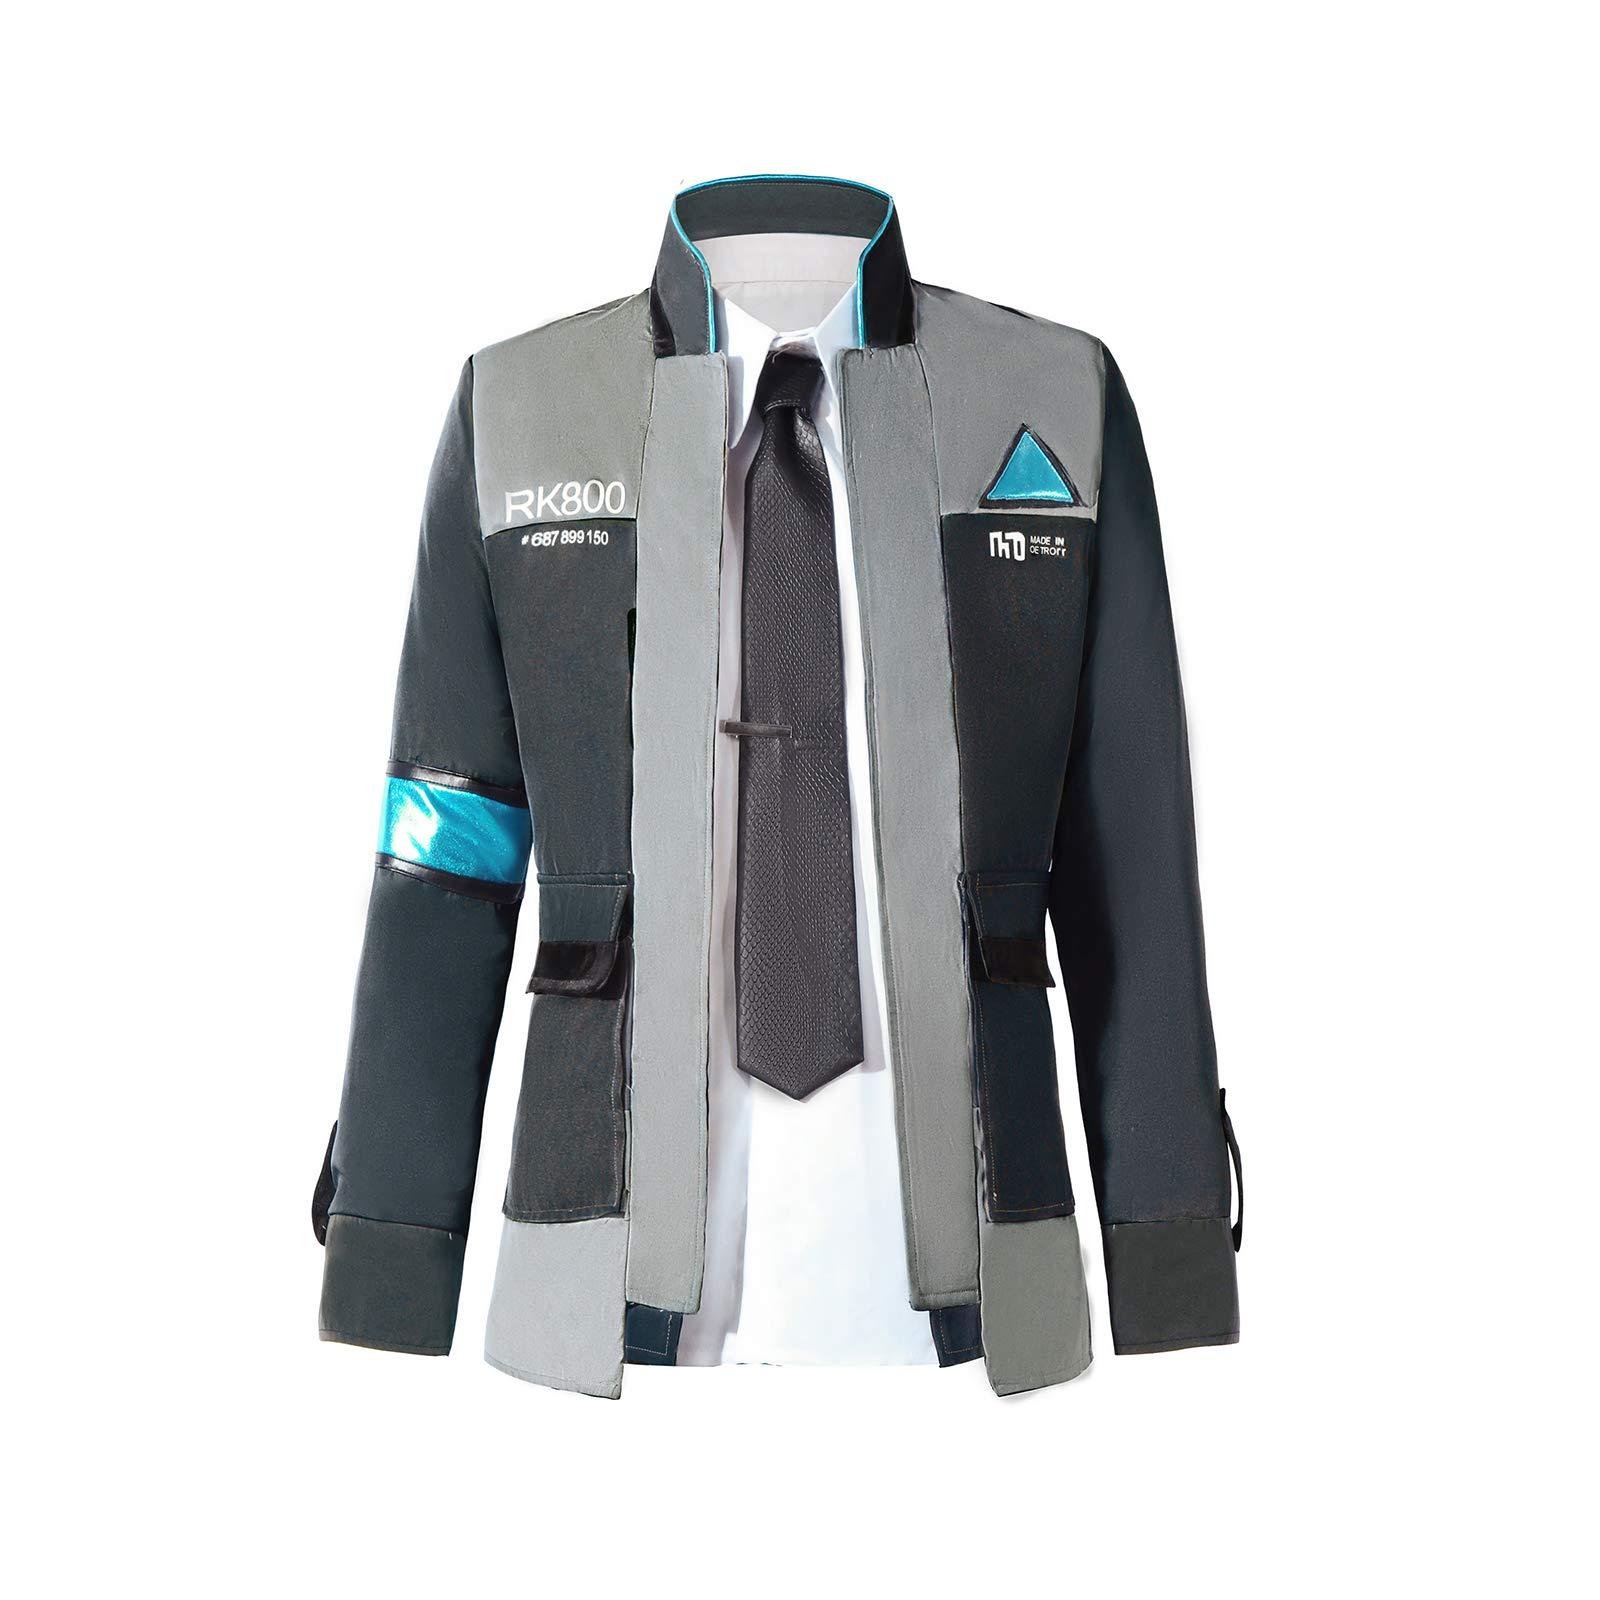 sandybeibei Become Human Cosplay Costume Mens Coat Uniform Suit by sandybeibei